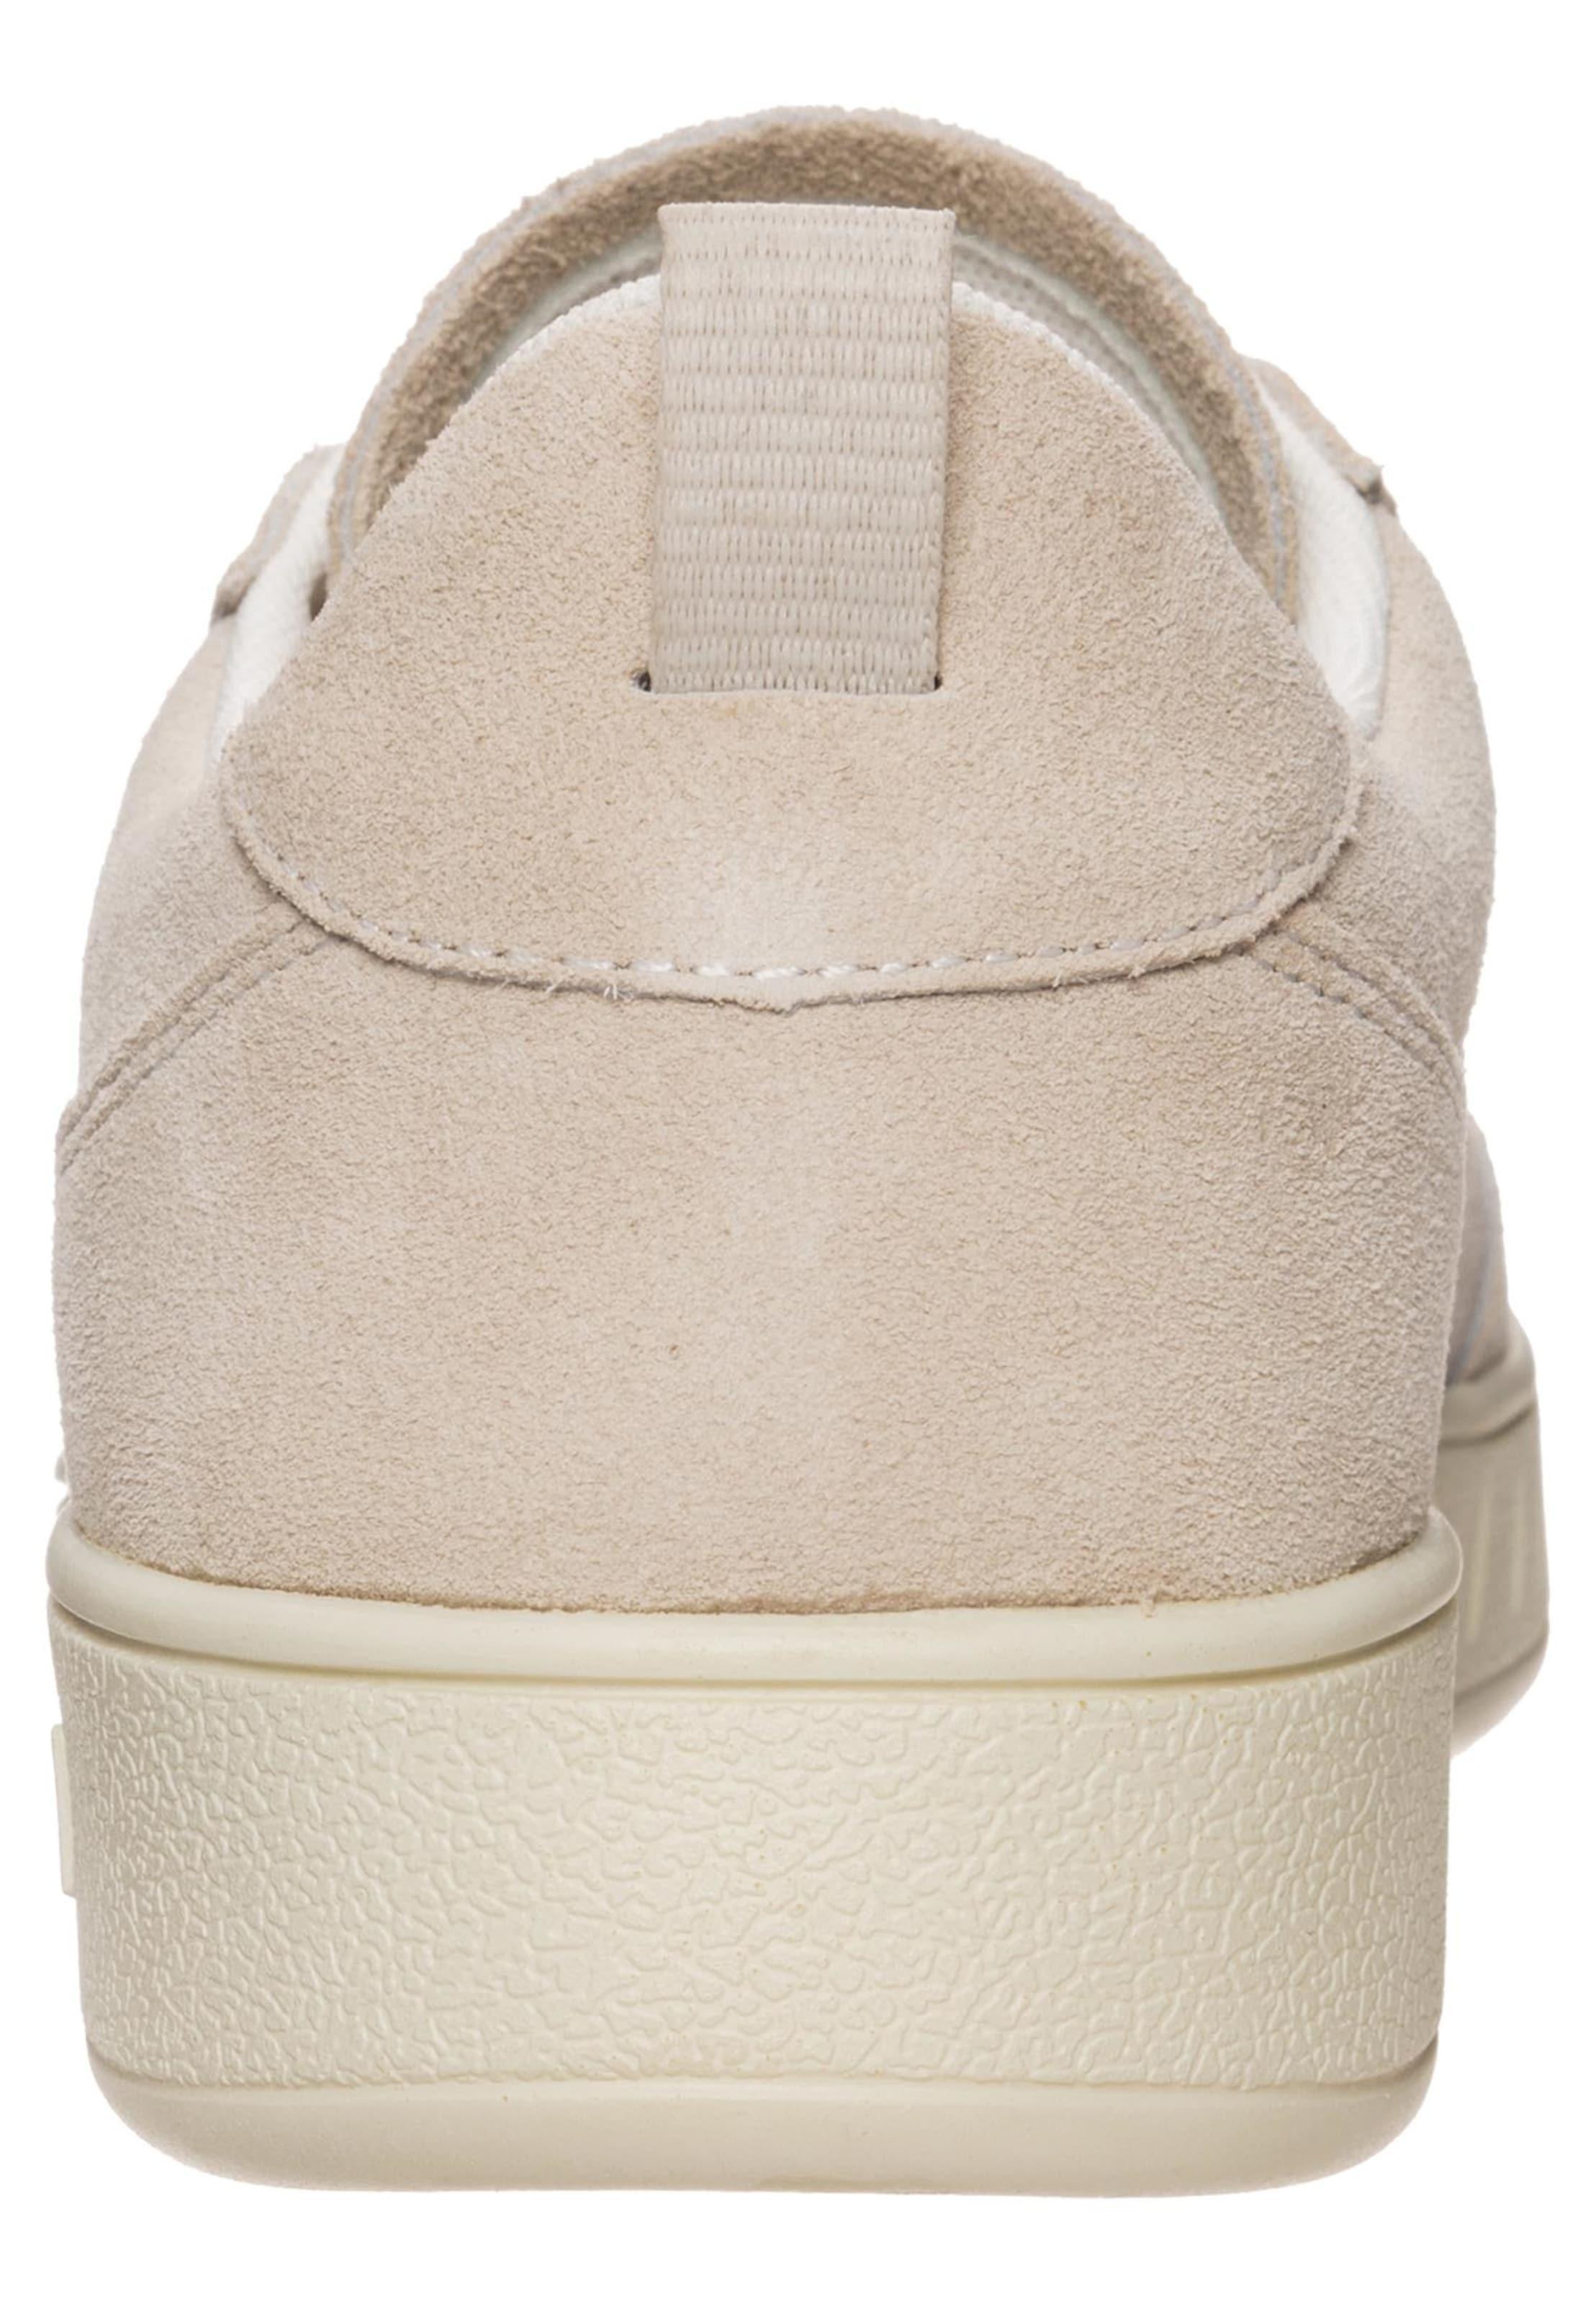 Sneaker Trimm' Hummel In Beige 'super WD2HIEY9